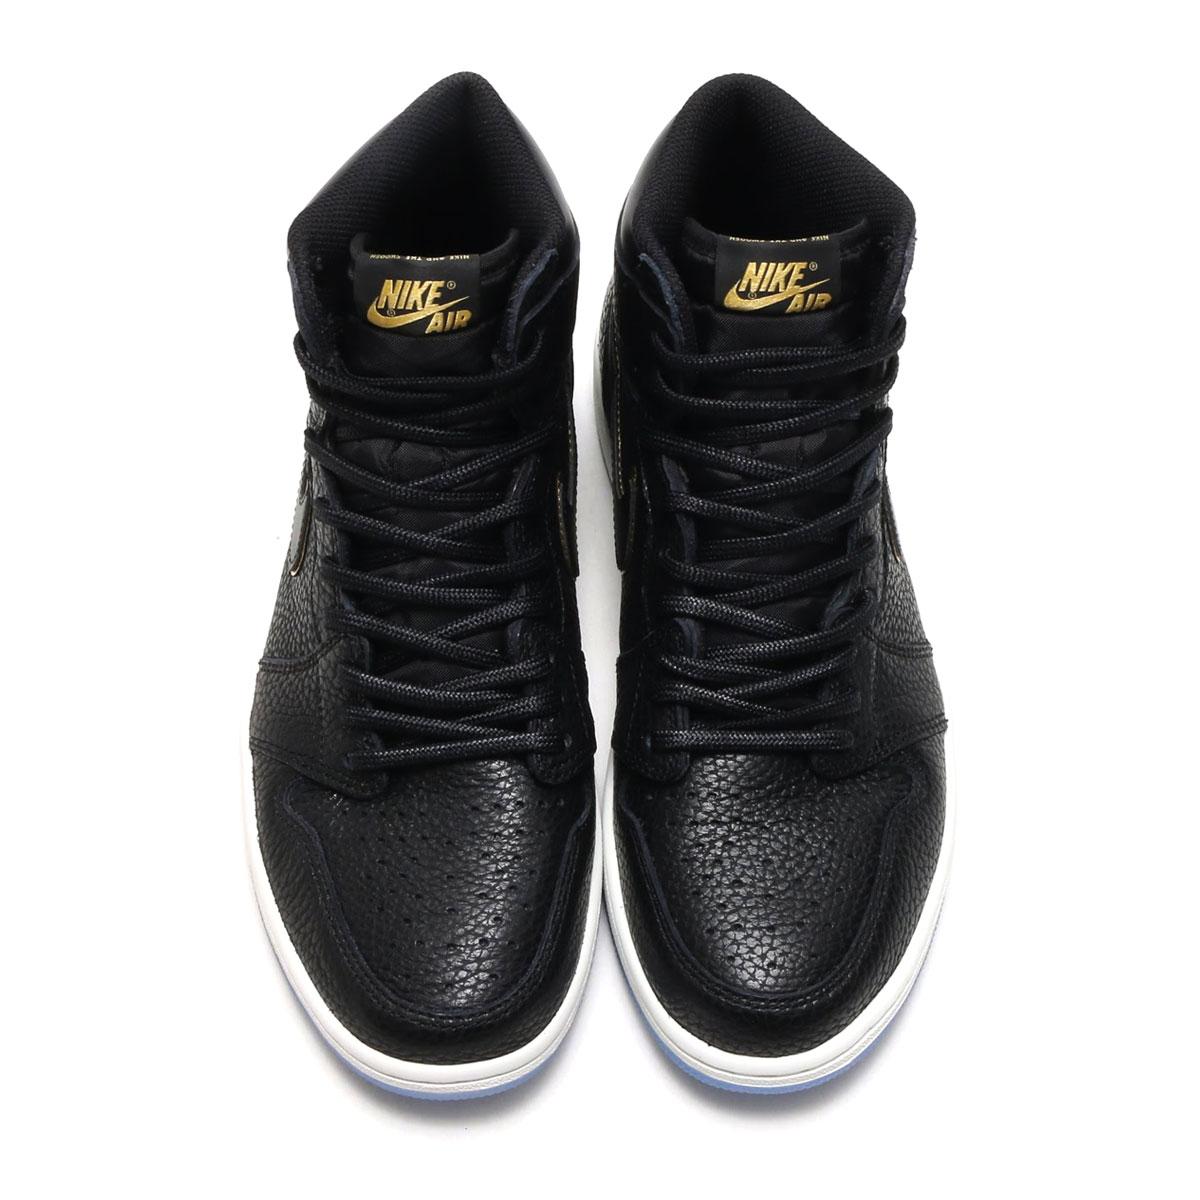 separation shoes 41d07 23b87 NIKE AIR JORDAN 1 RETRO HIGH OG (Nike Air Jordan 1 nostalgic high OG) (BLACK  METALLIC GOLD-SUMMIT WHITE) 18SP-S